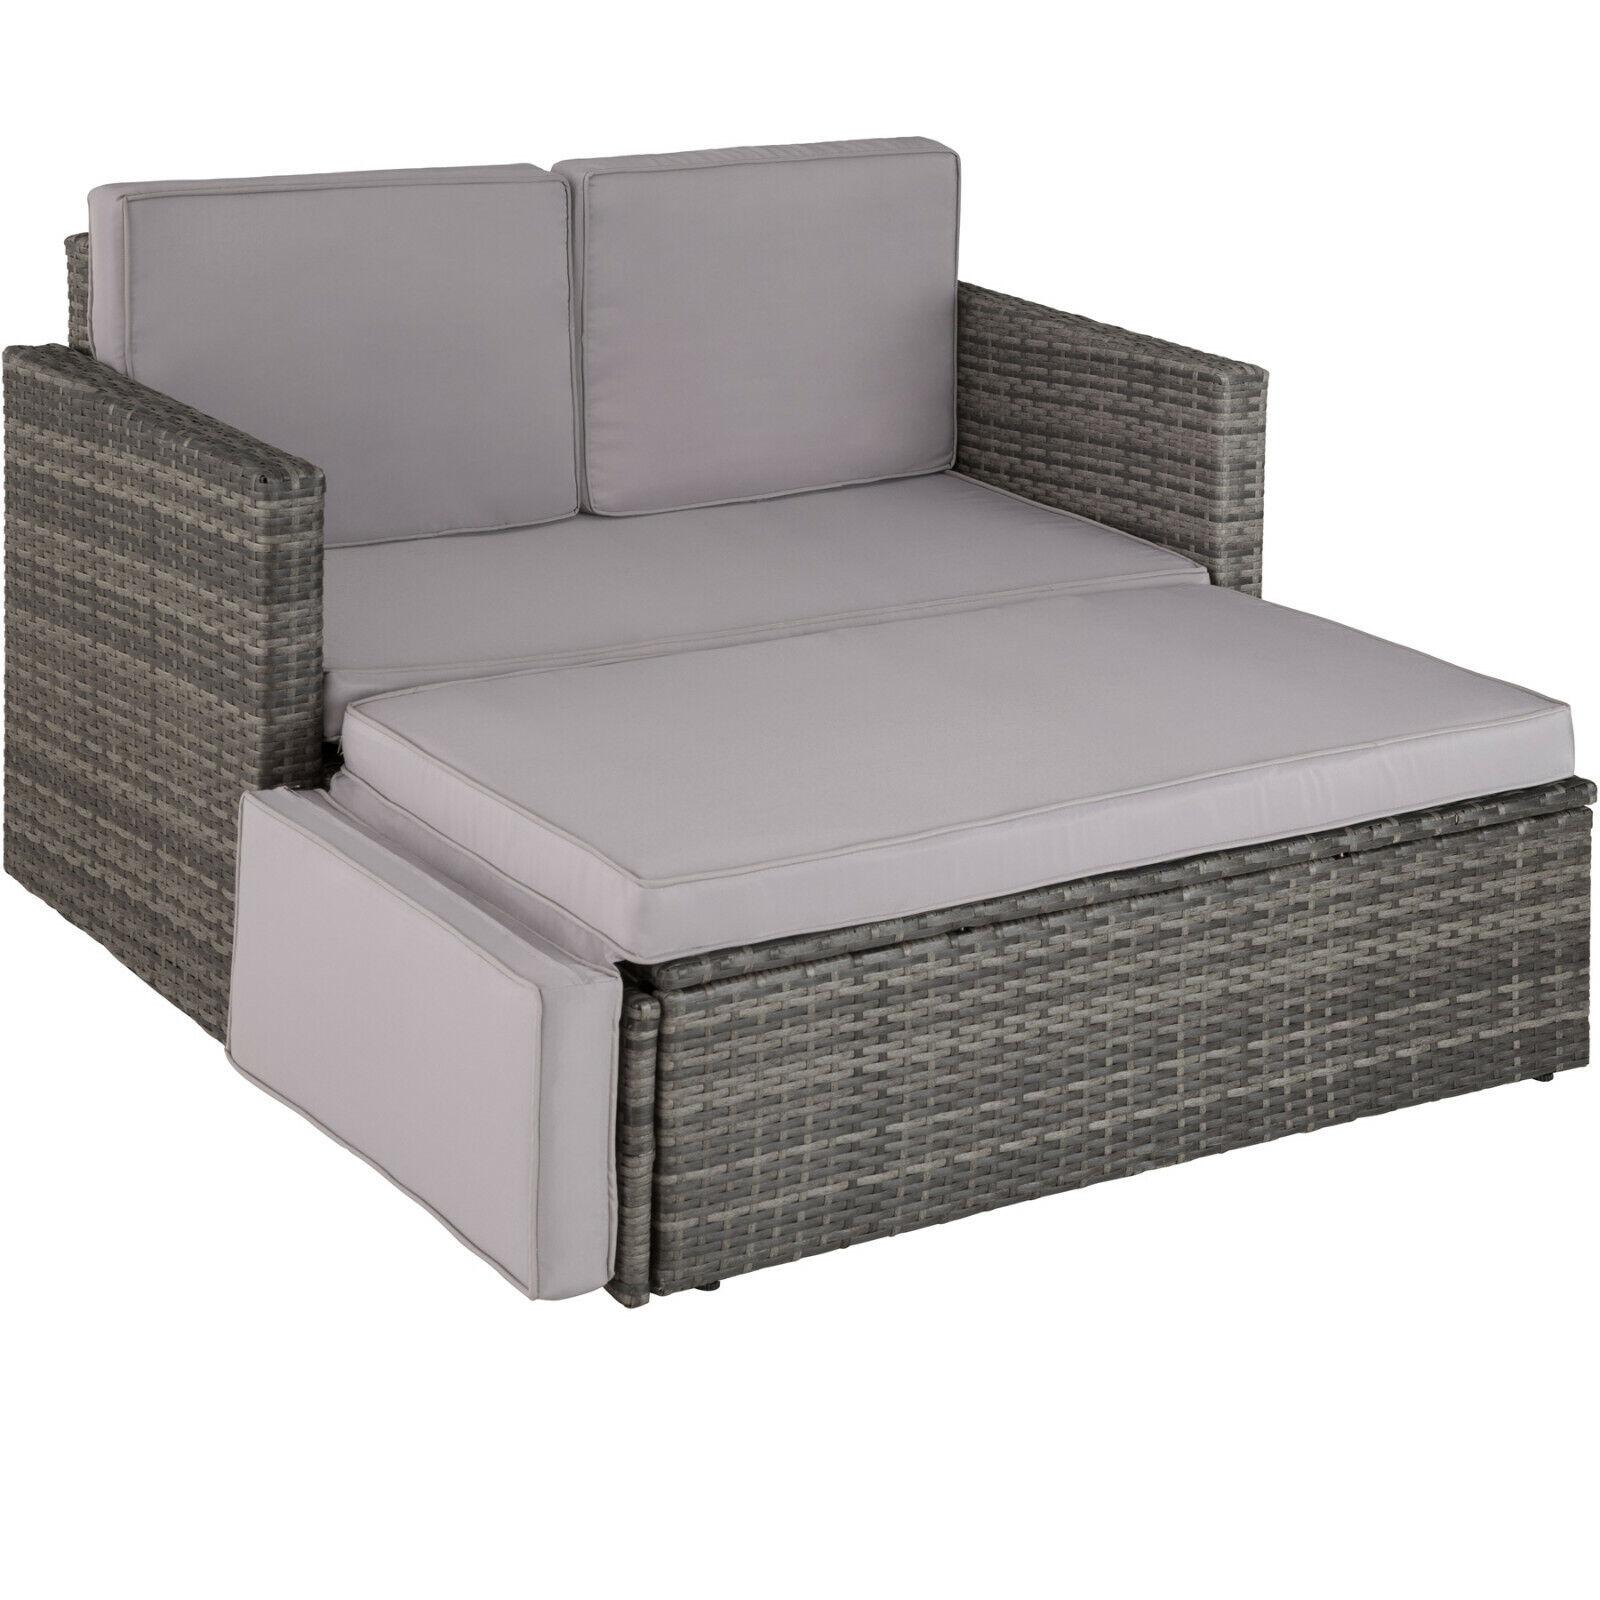 Poly Rattan Lounge Set Sitzgruppe Garten Sofa Couch Ottomane Hocker grau BWare